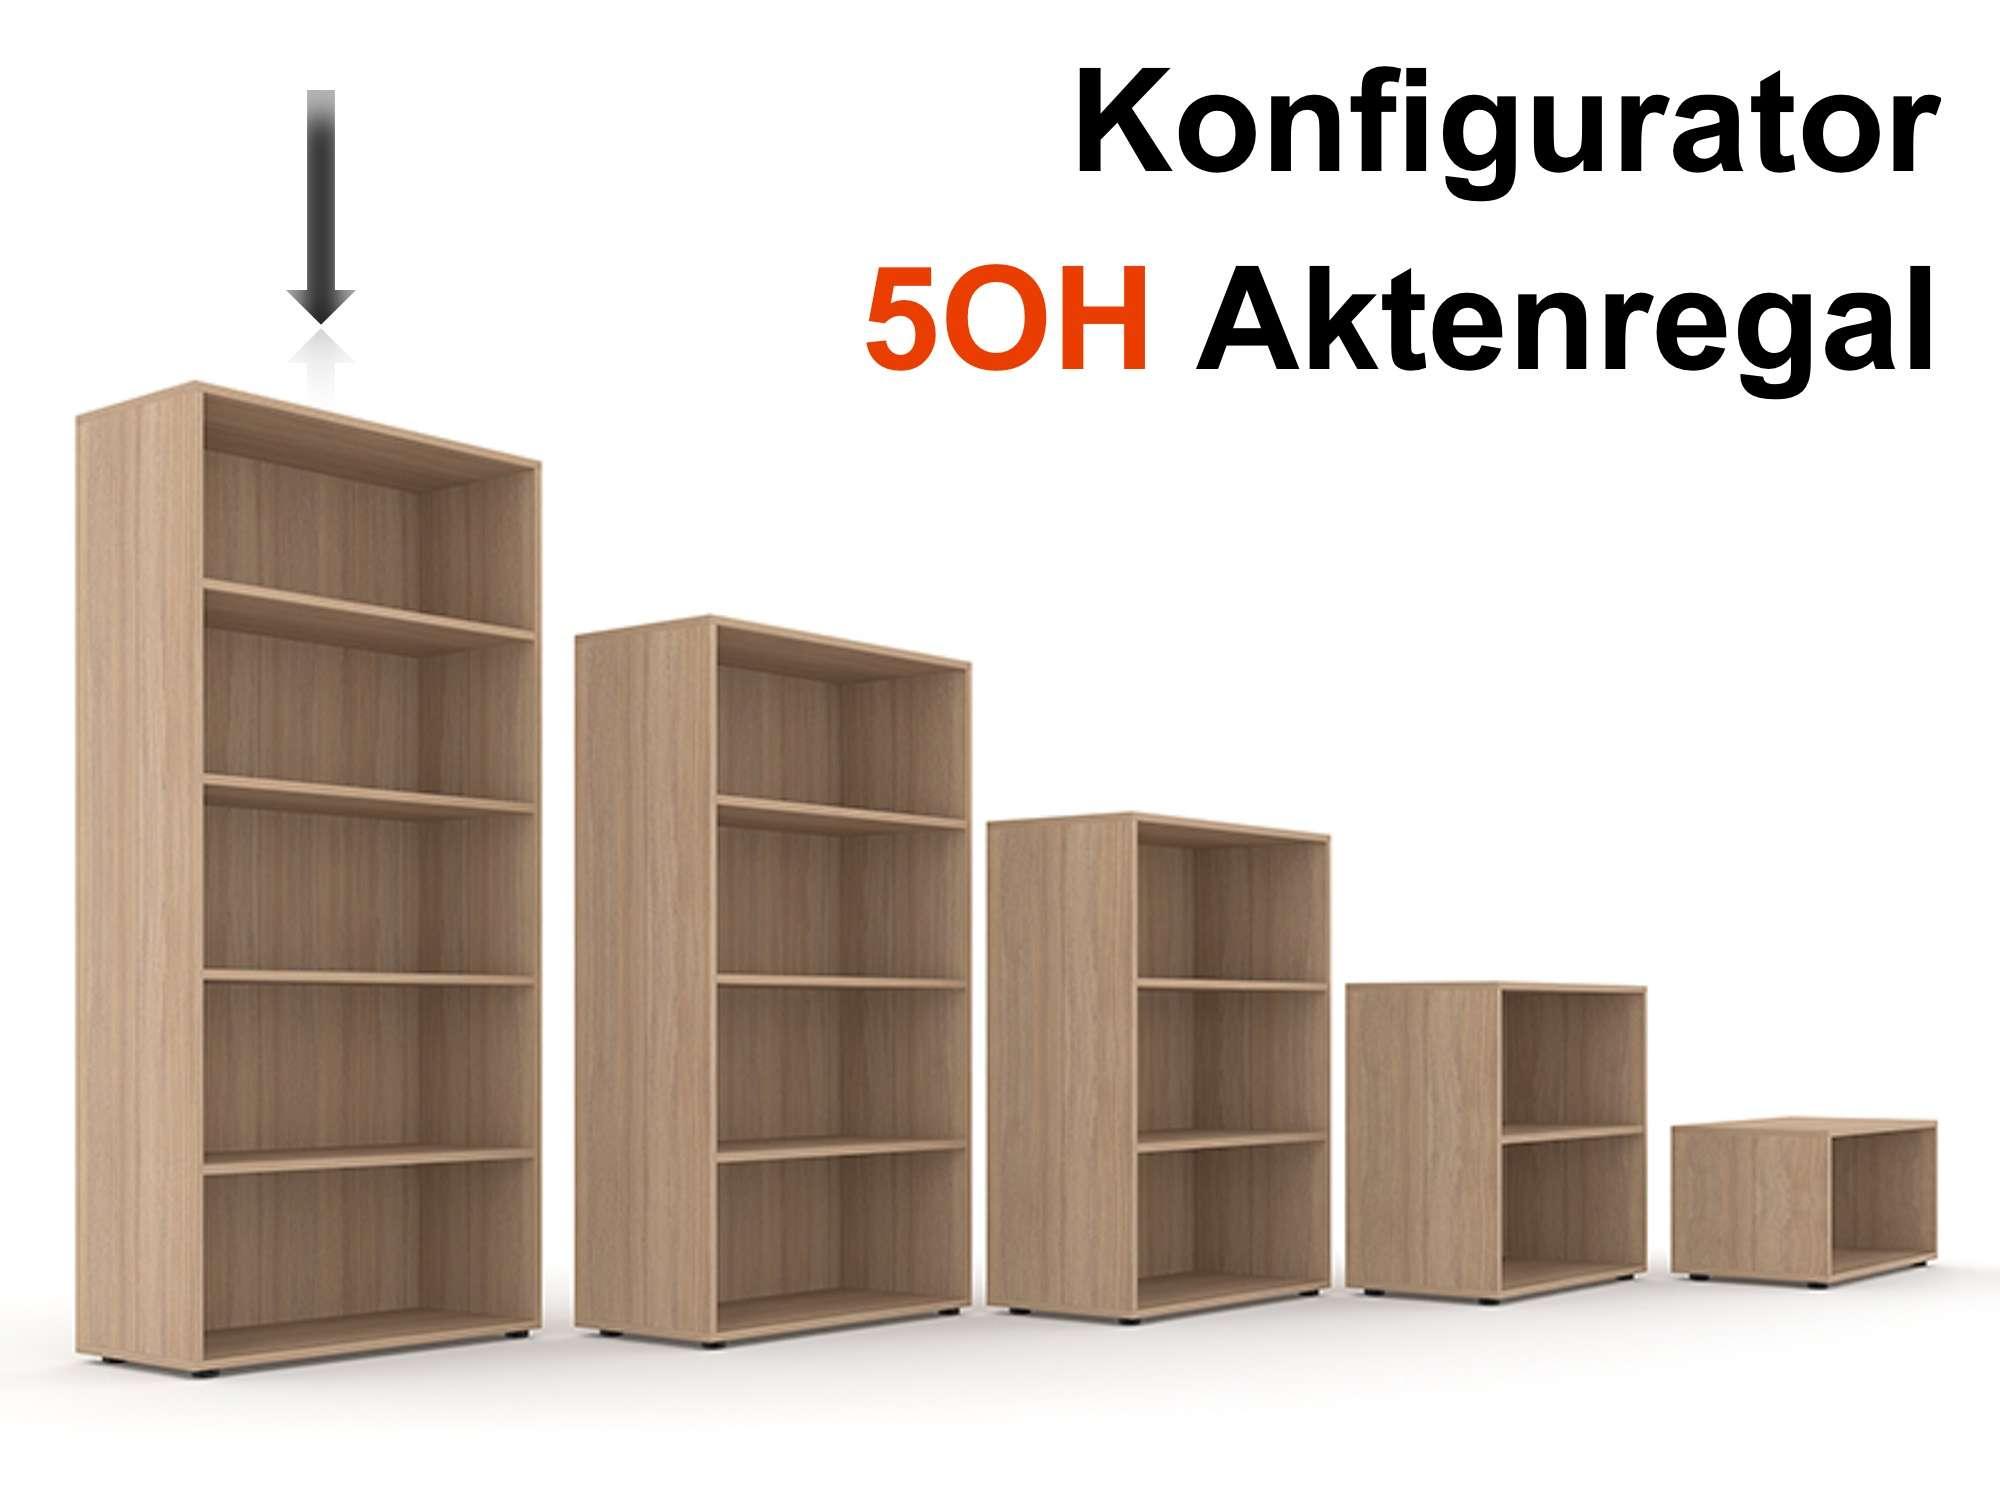 Aktenregal Selection 5OH - Konfigurator | Aktenregale | Büroregale ...